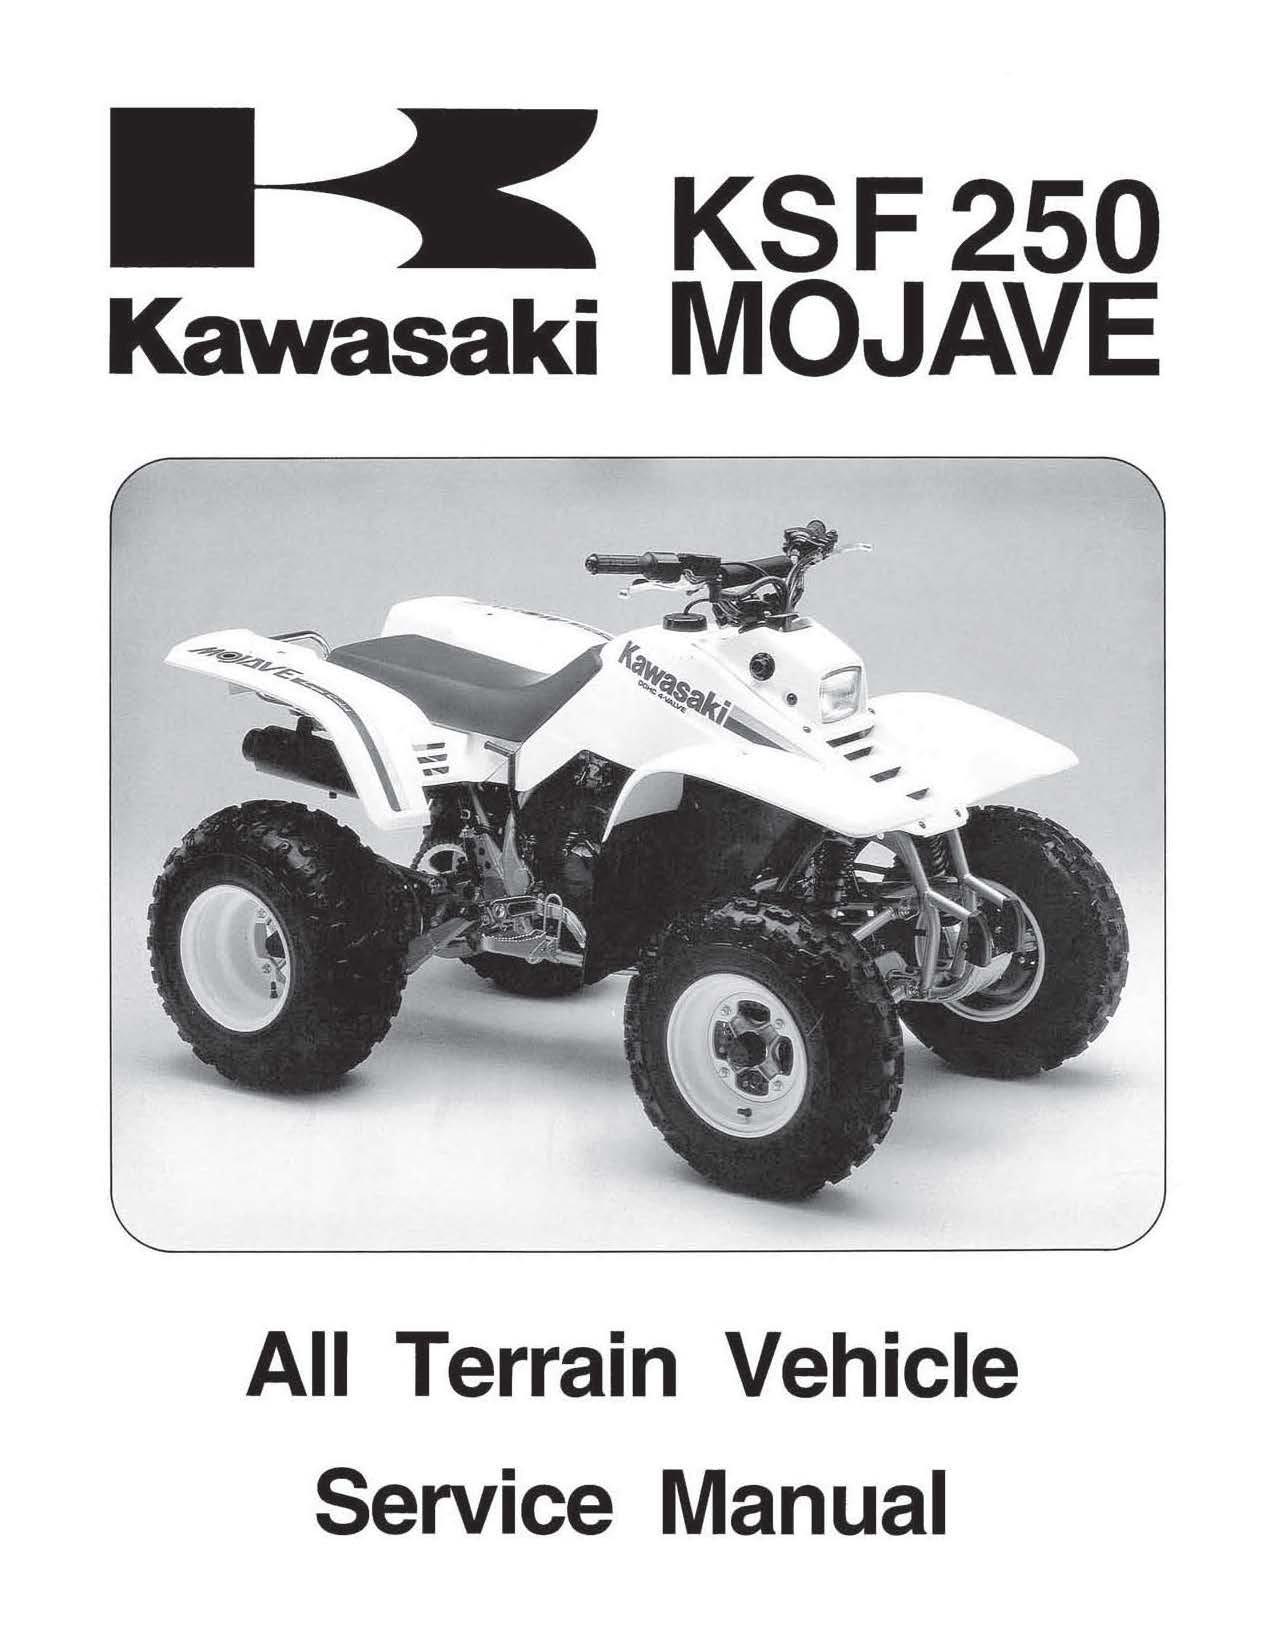 Kawasaki 250 Mojave 4 Wheeler Wiring Diagram | Wiring Liry on